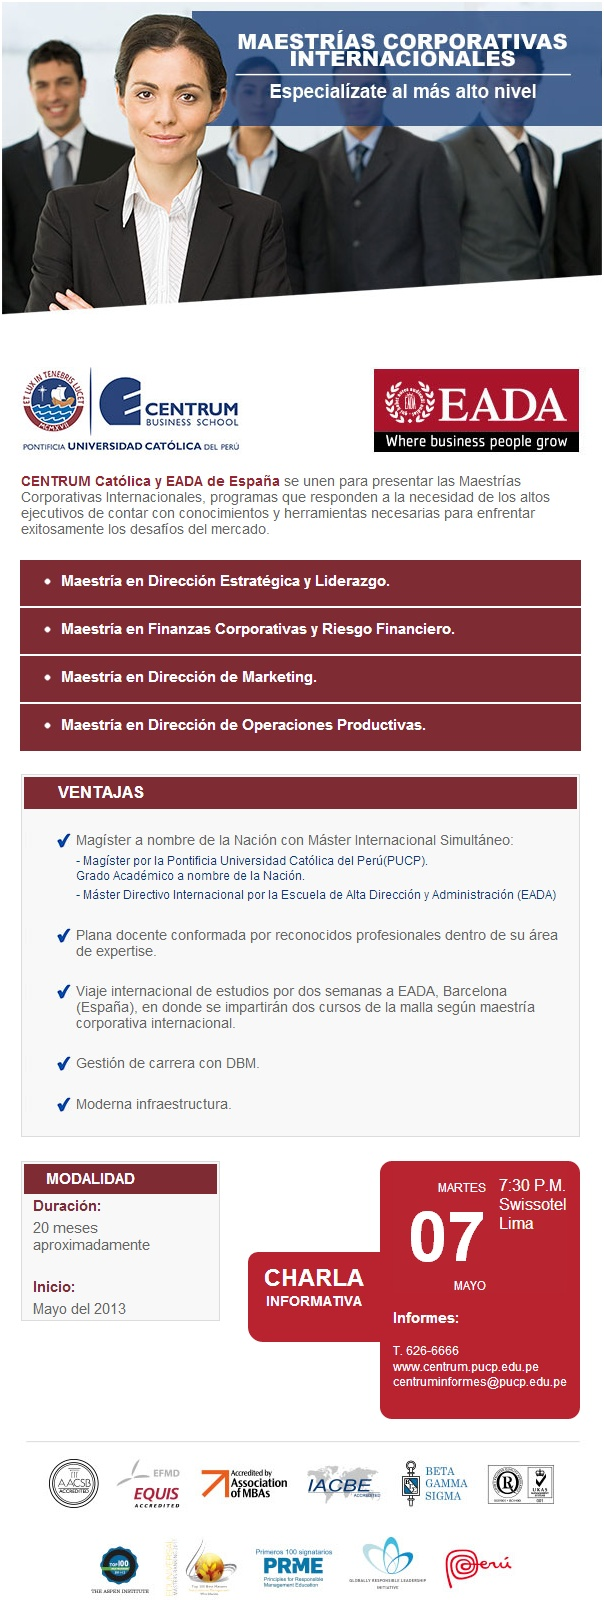 Maestrías Corporativas  CENTRUM Católica   Invitación Charla Maestrías Corporativas